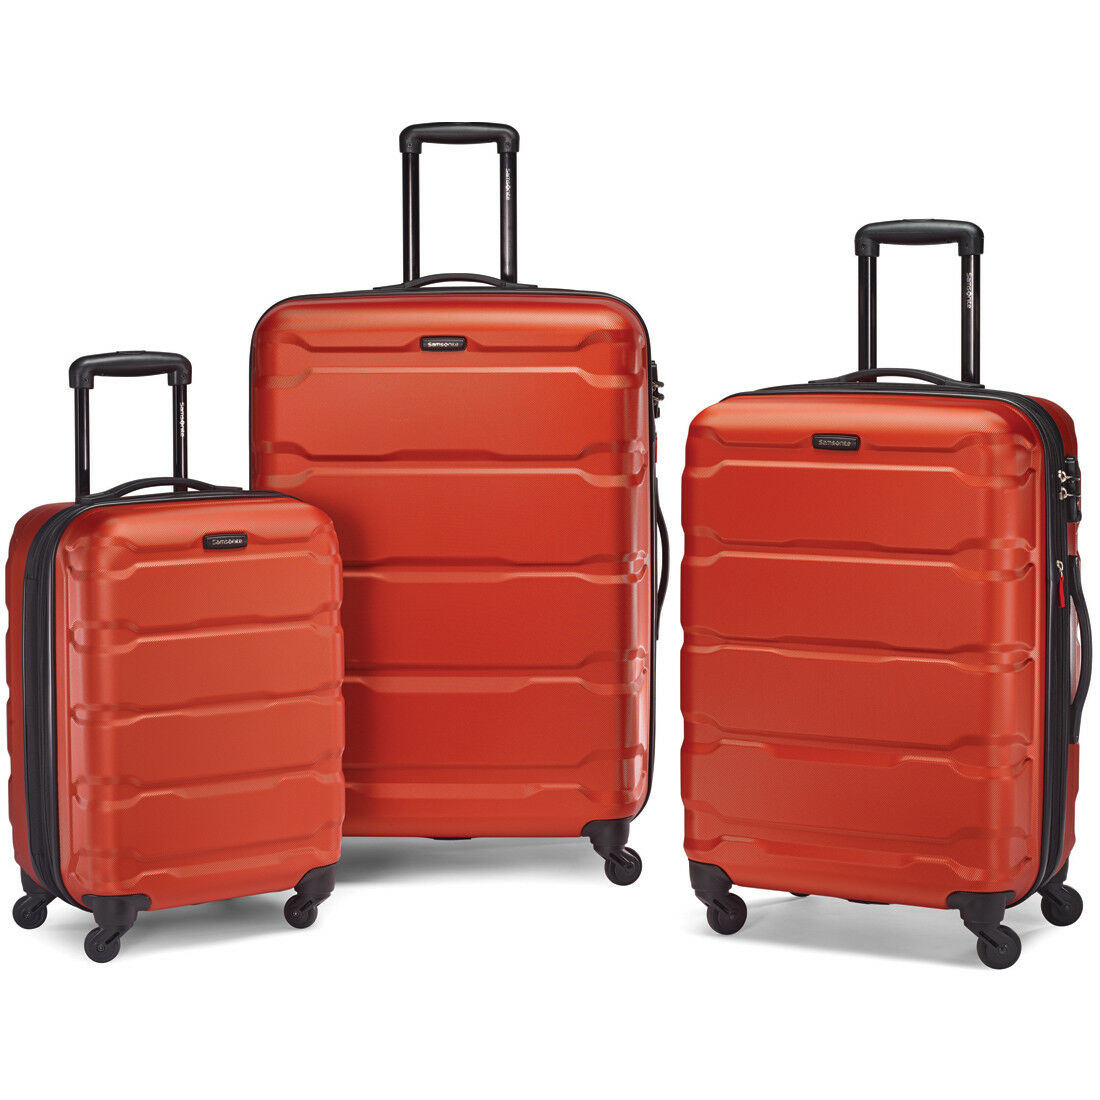 Samsonite Omni Hardside 3 Piece Nested Spinner Luggage Set (20, 24, & 28 Inch) Burnt Orange